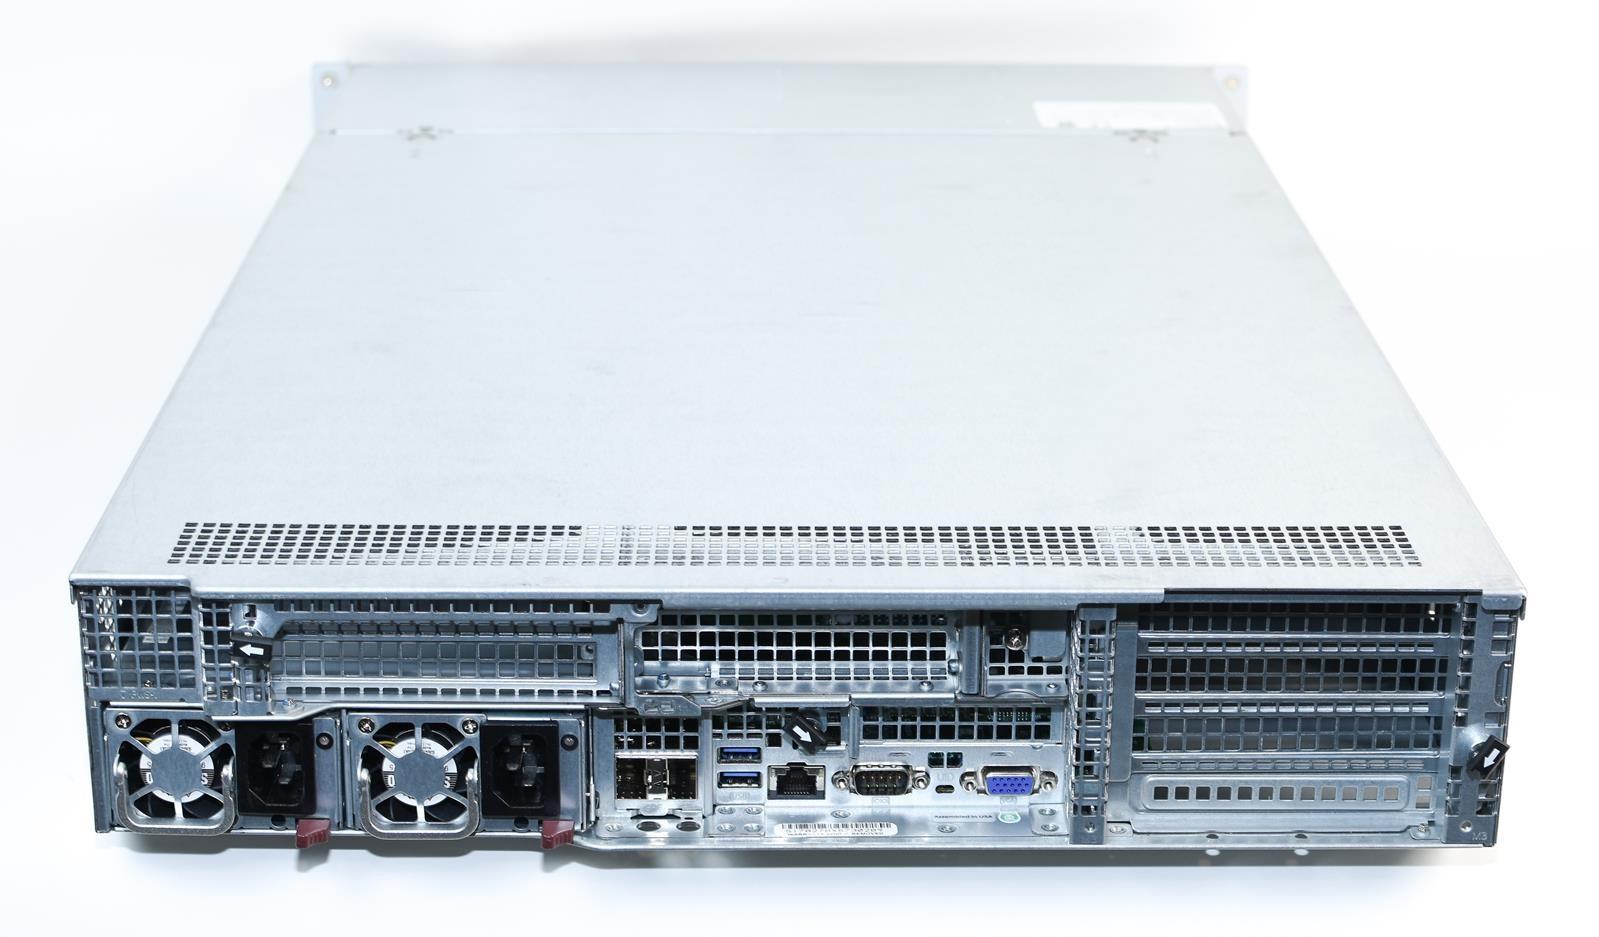 SUPERMICRO SYS-6028U-TRTP+ X10DRU-i+ 2x LGA2011v3 E5-2600v3